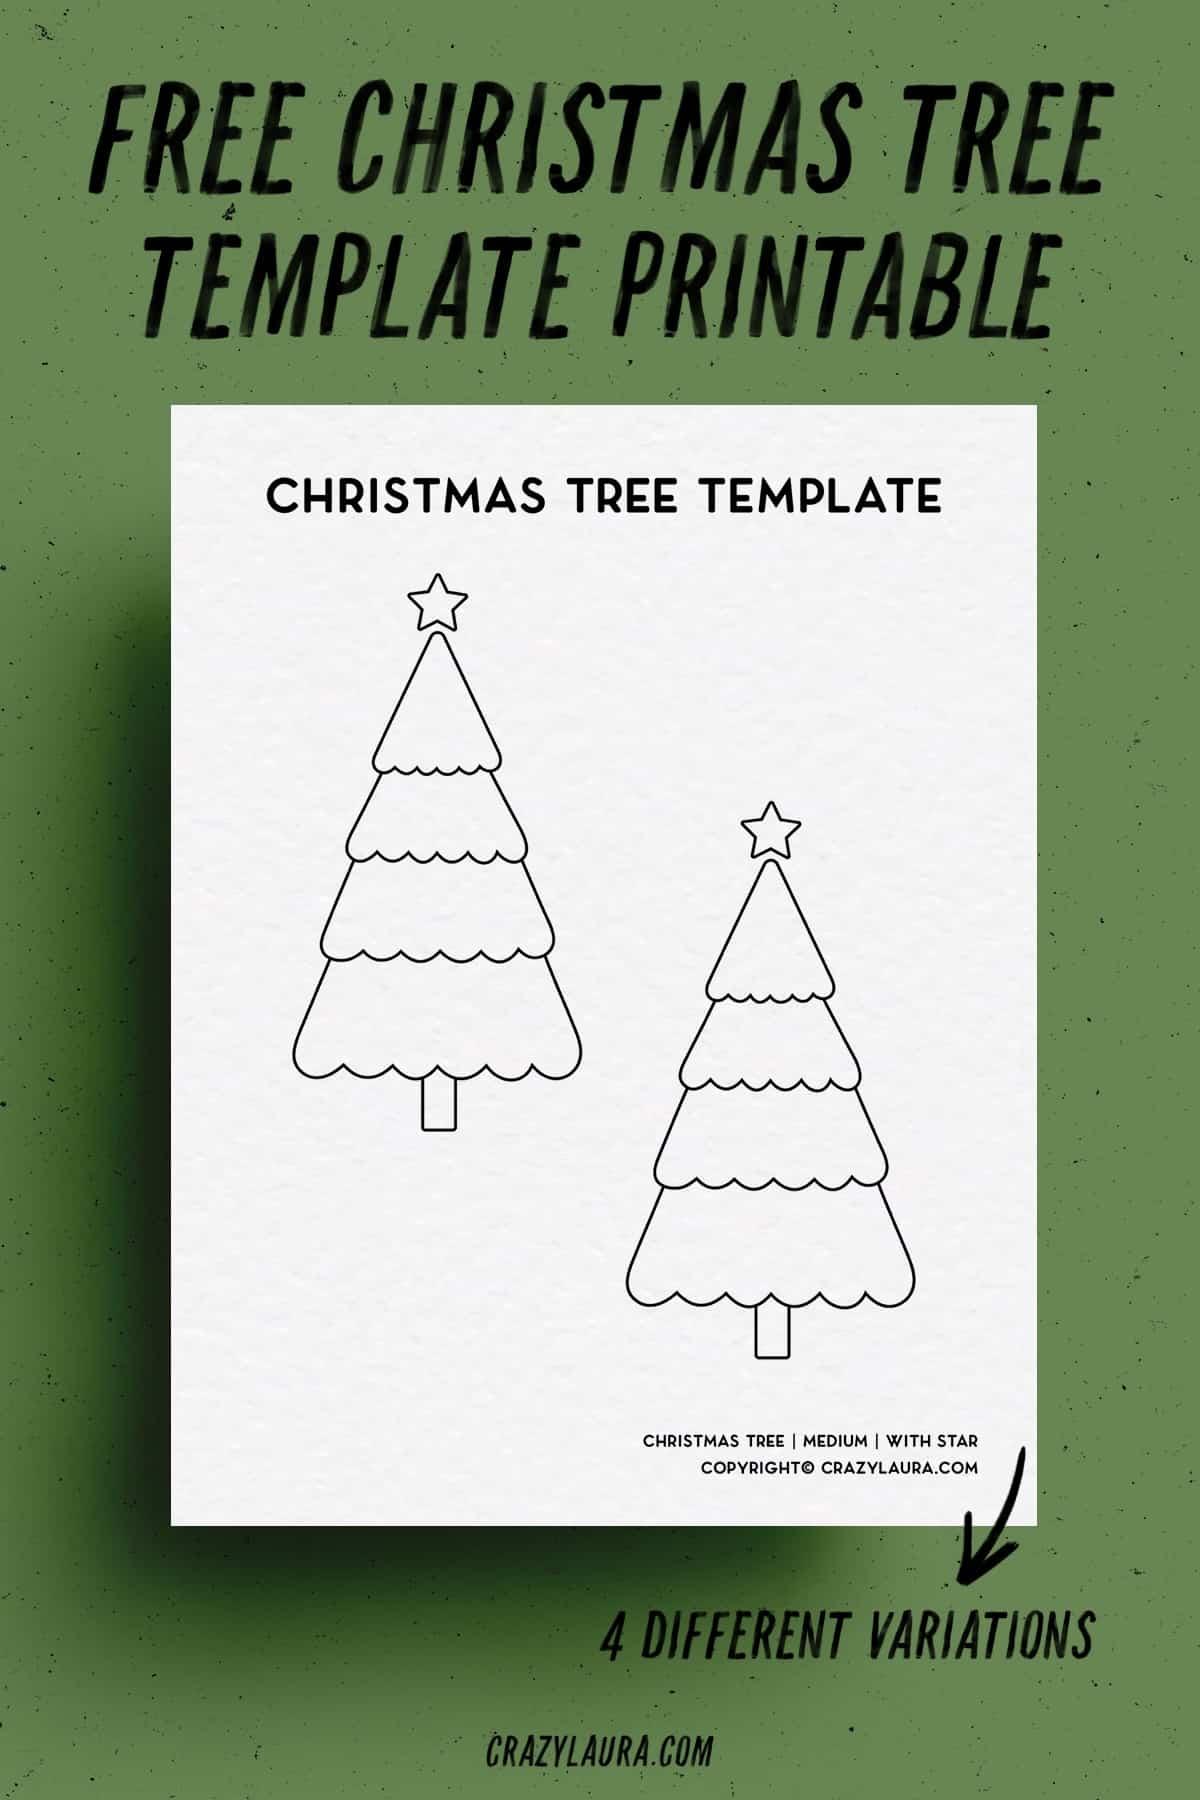 xmas tree shape template for free